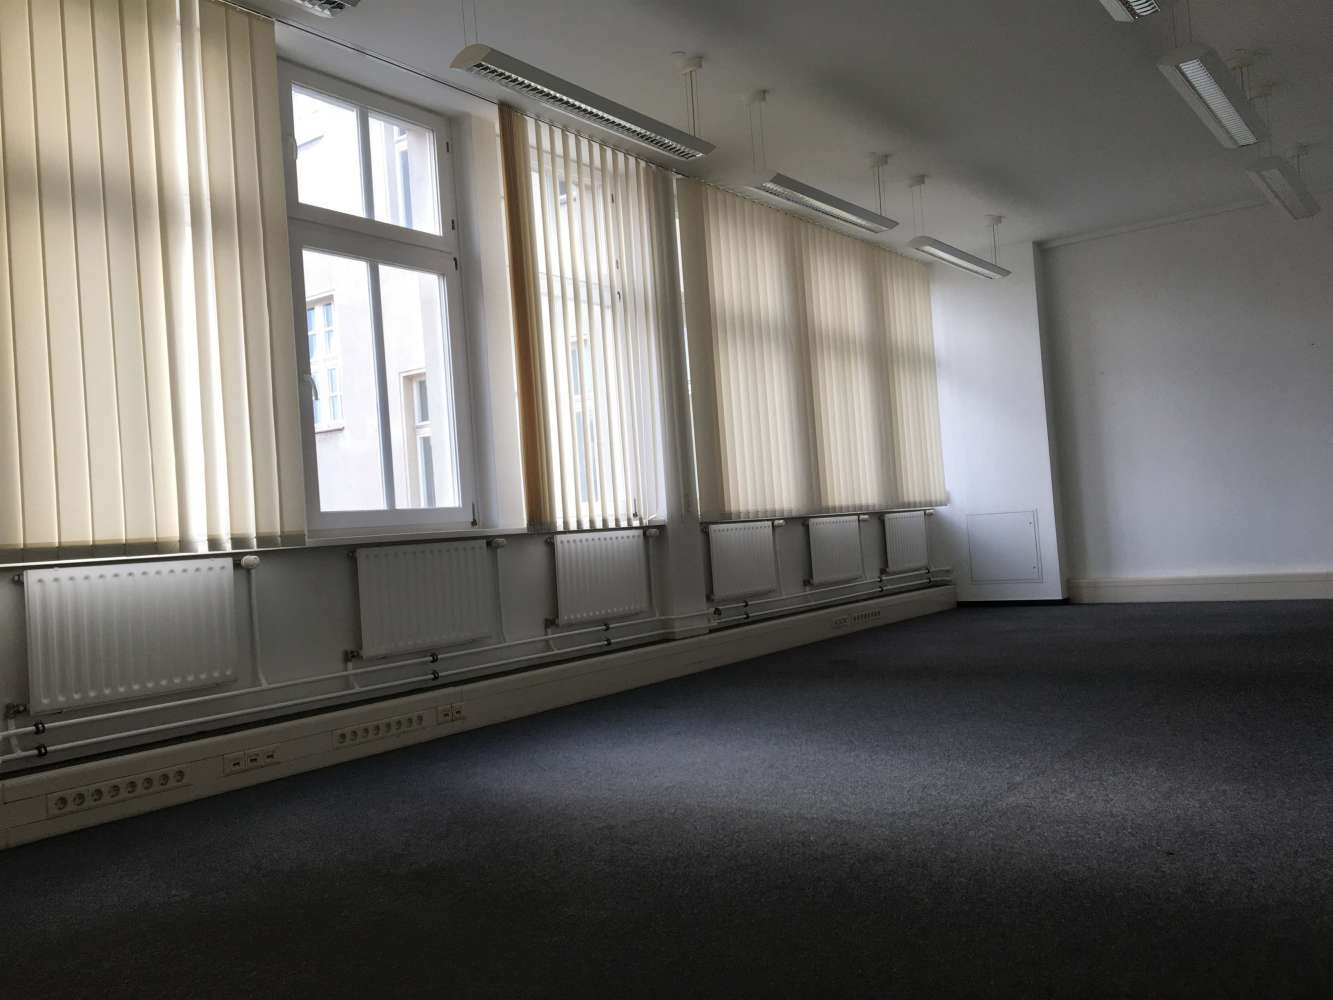 Büros Berlin, 10783 - Büro - Berlin, Schöneberg - B1537 - 9748143